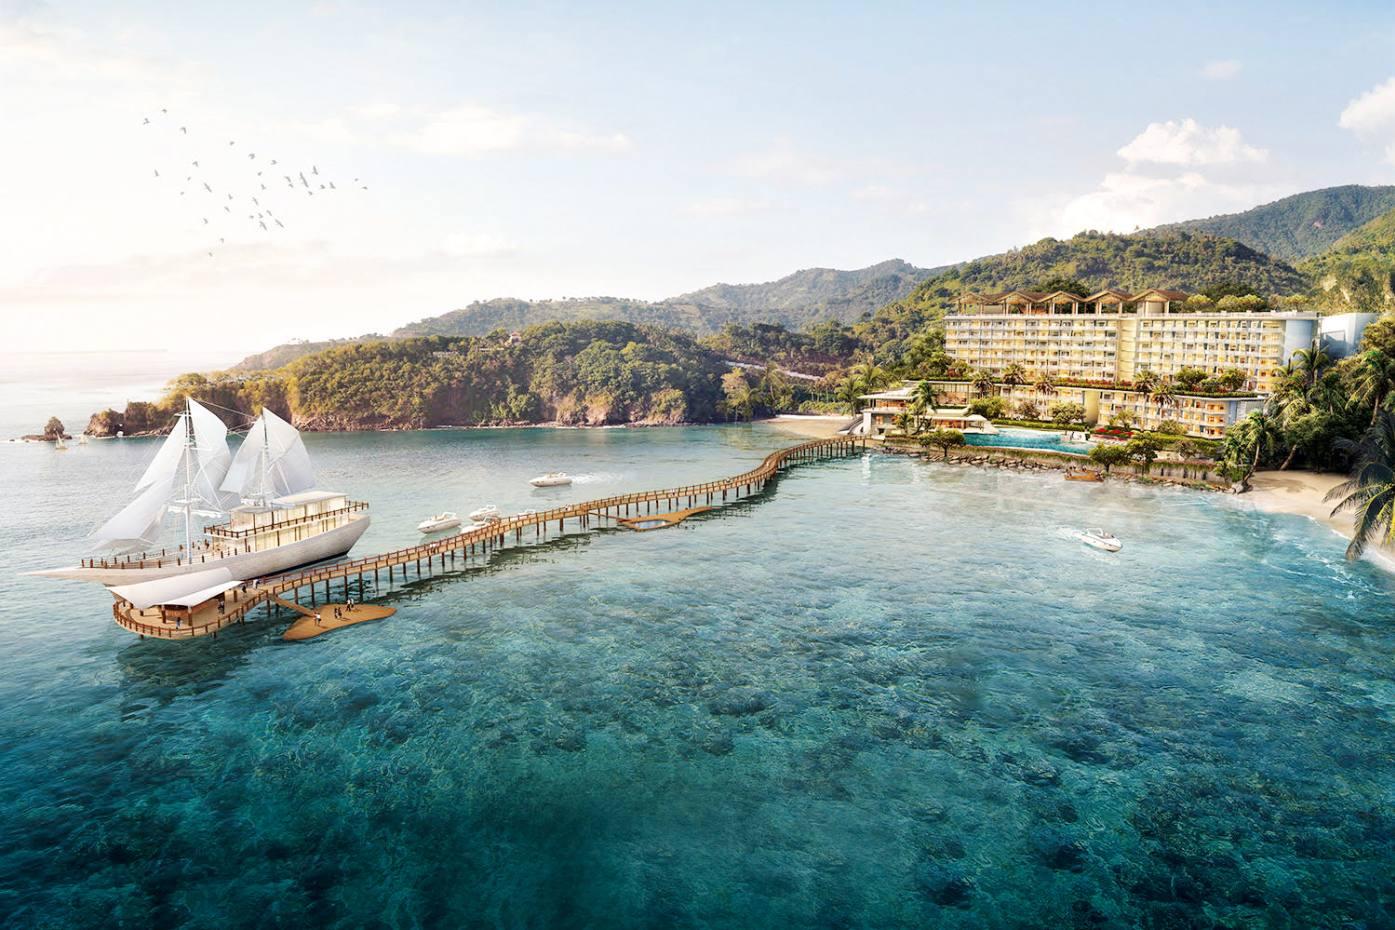 Ayana Resort's 54m Lako di'a phinisi atits new Komodo Waecicu Beach property on Flores Island in Indonesia